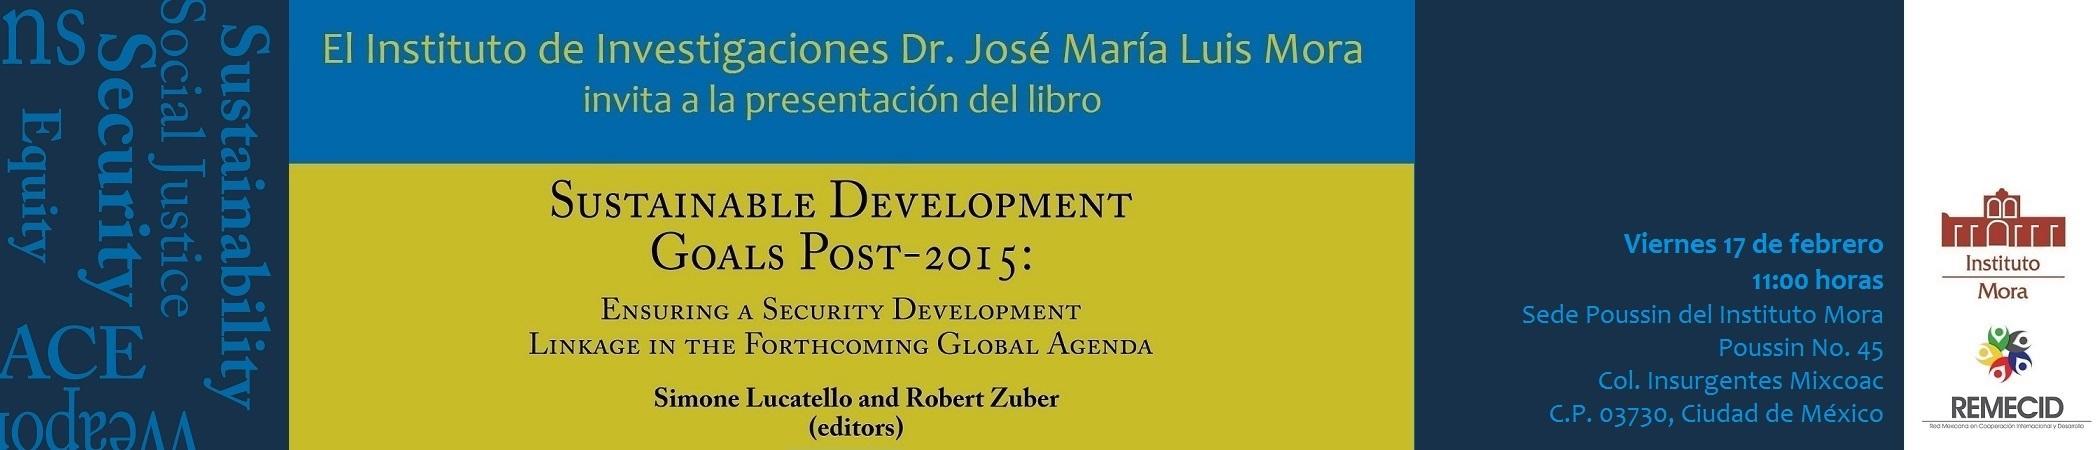 Presentación del libro Sustainable Development Goals Post-2015